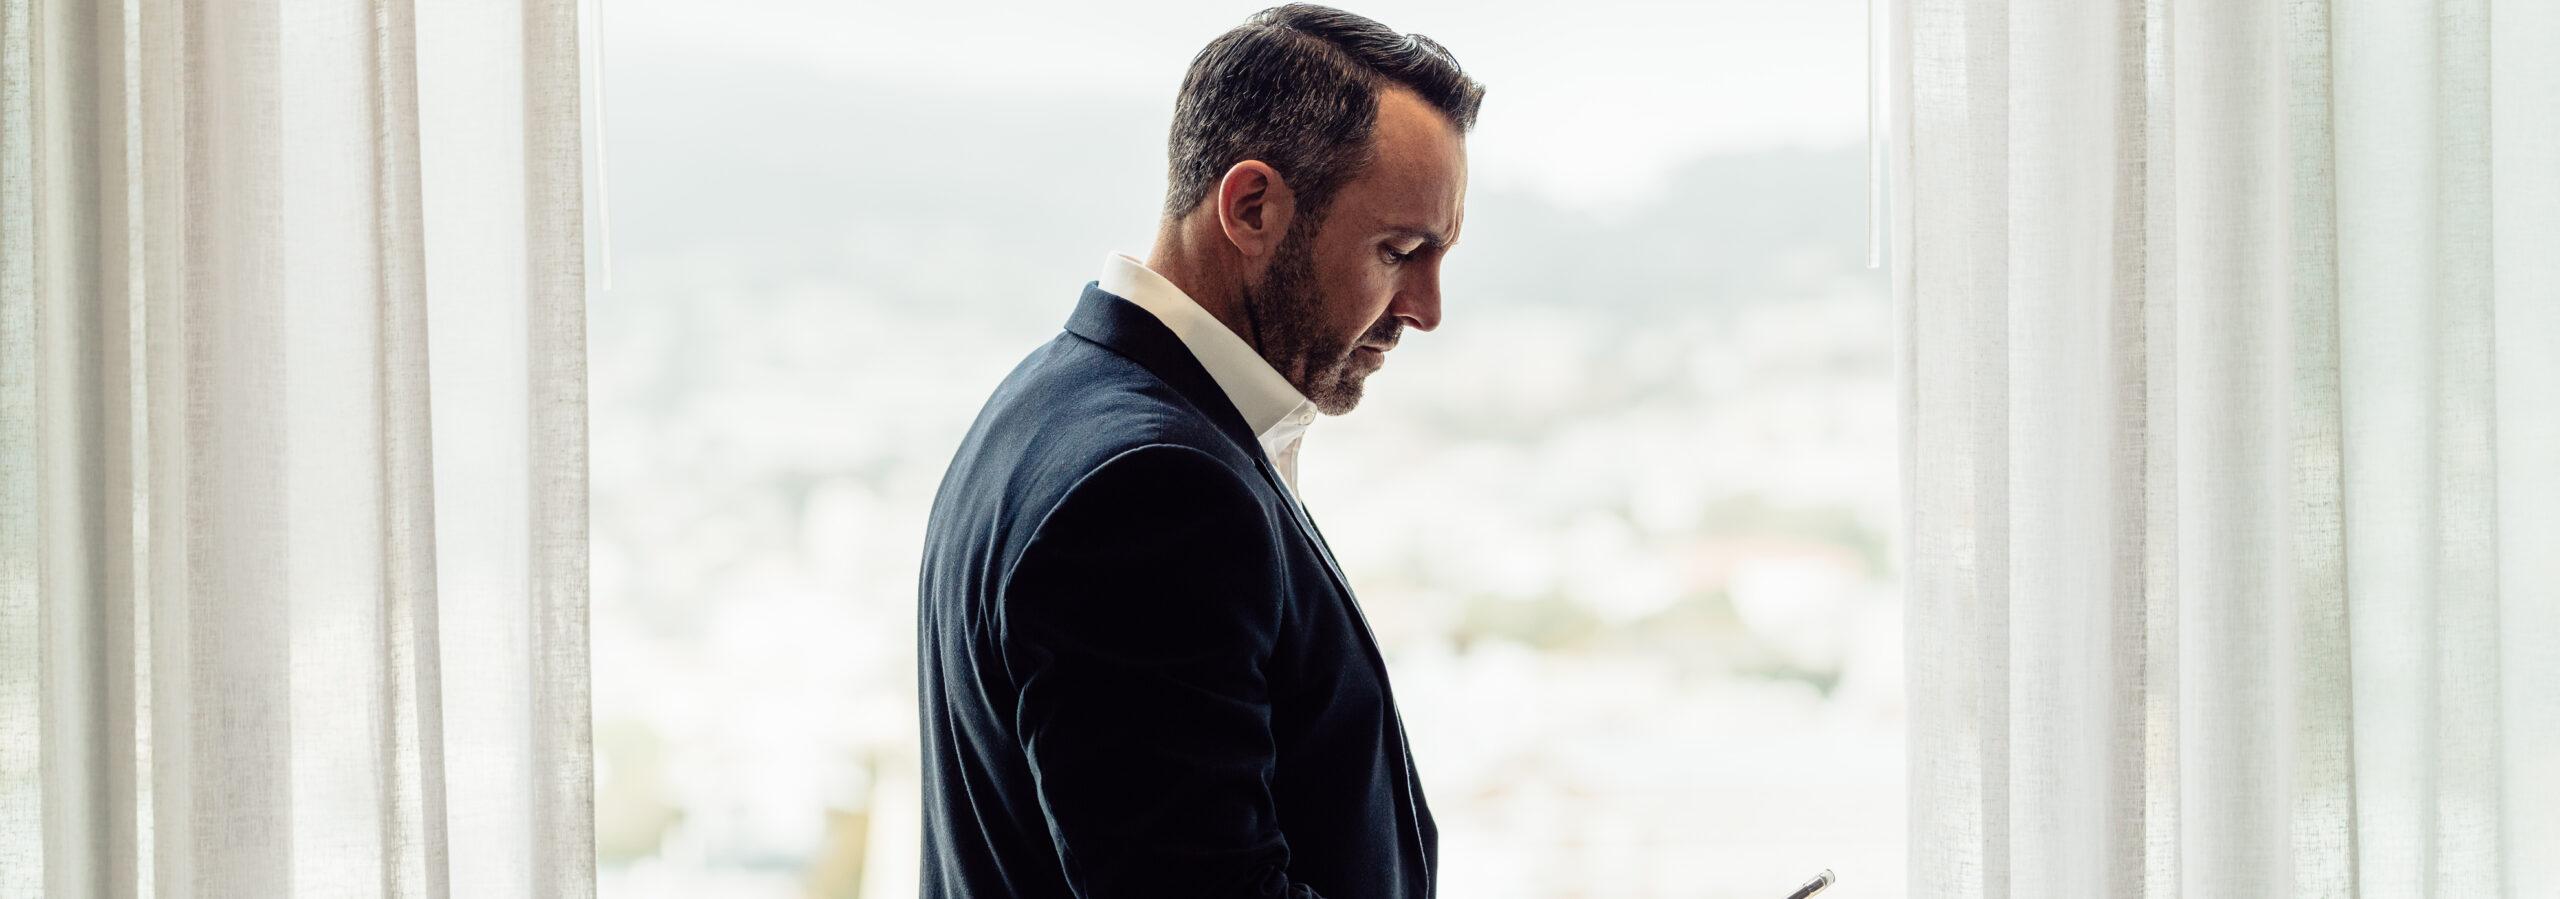 Pensive man in suit